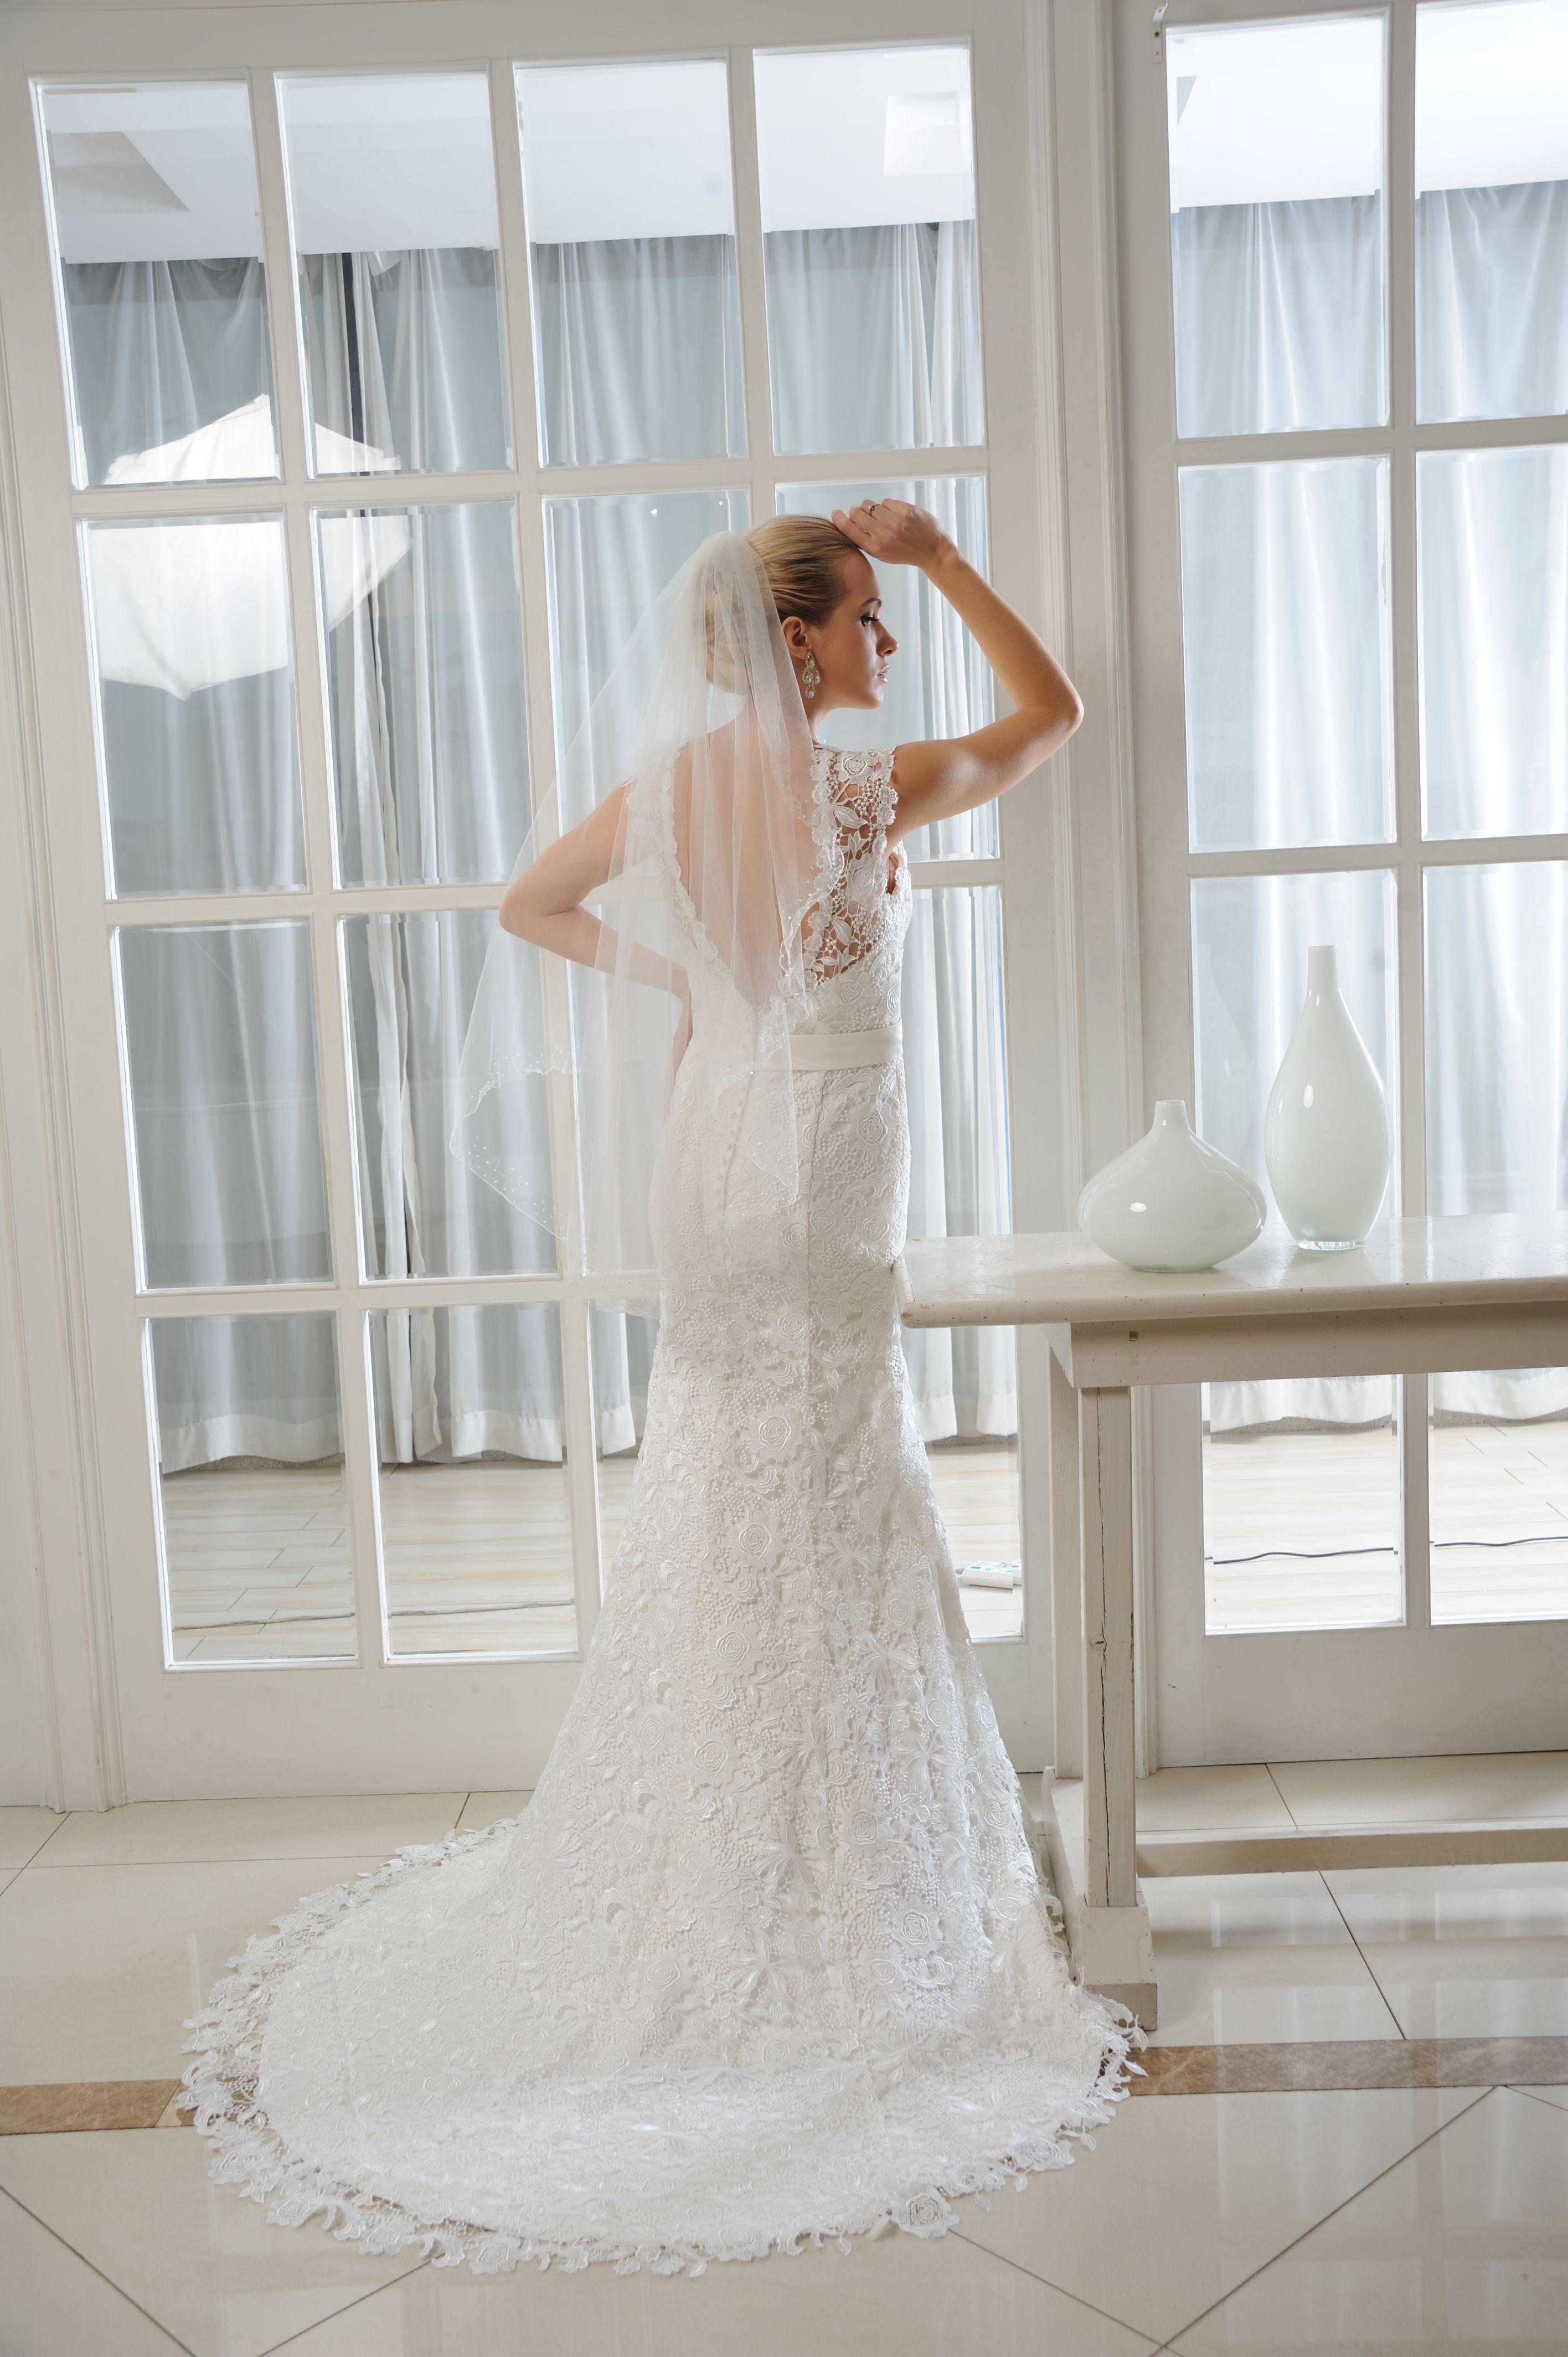 Madison Brides by Harvee lace fishtail wedding dress